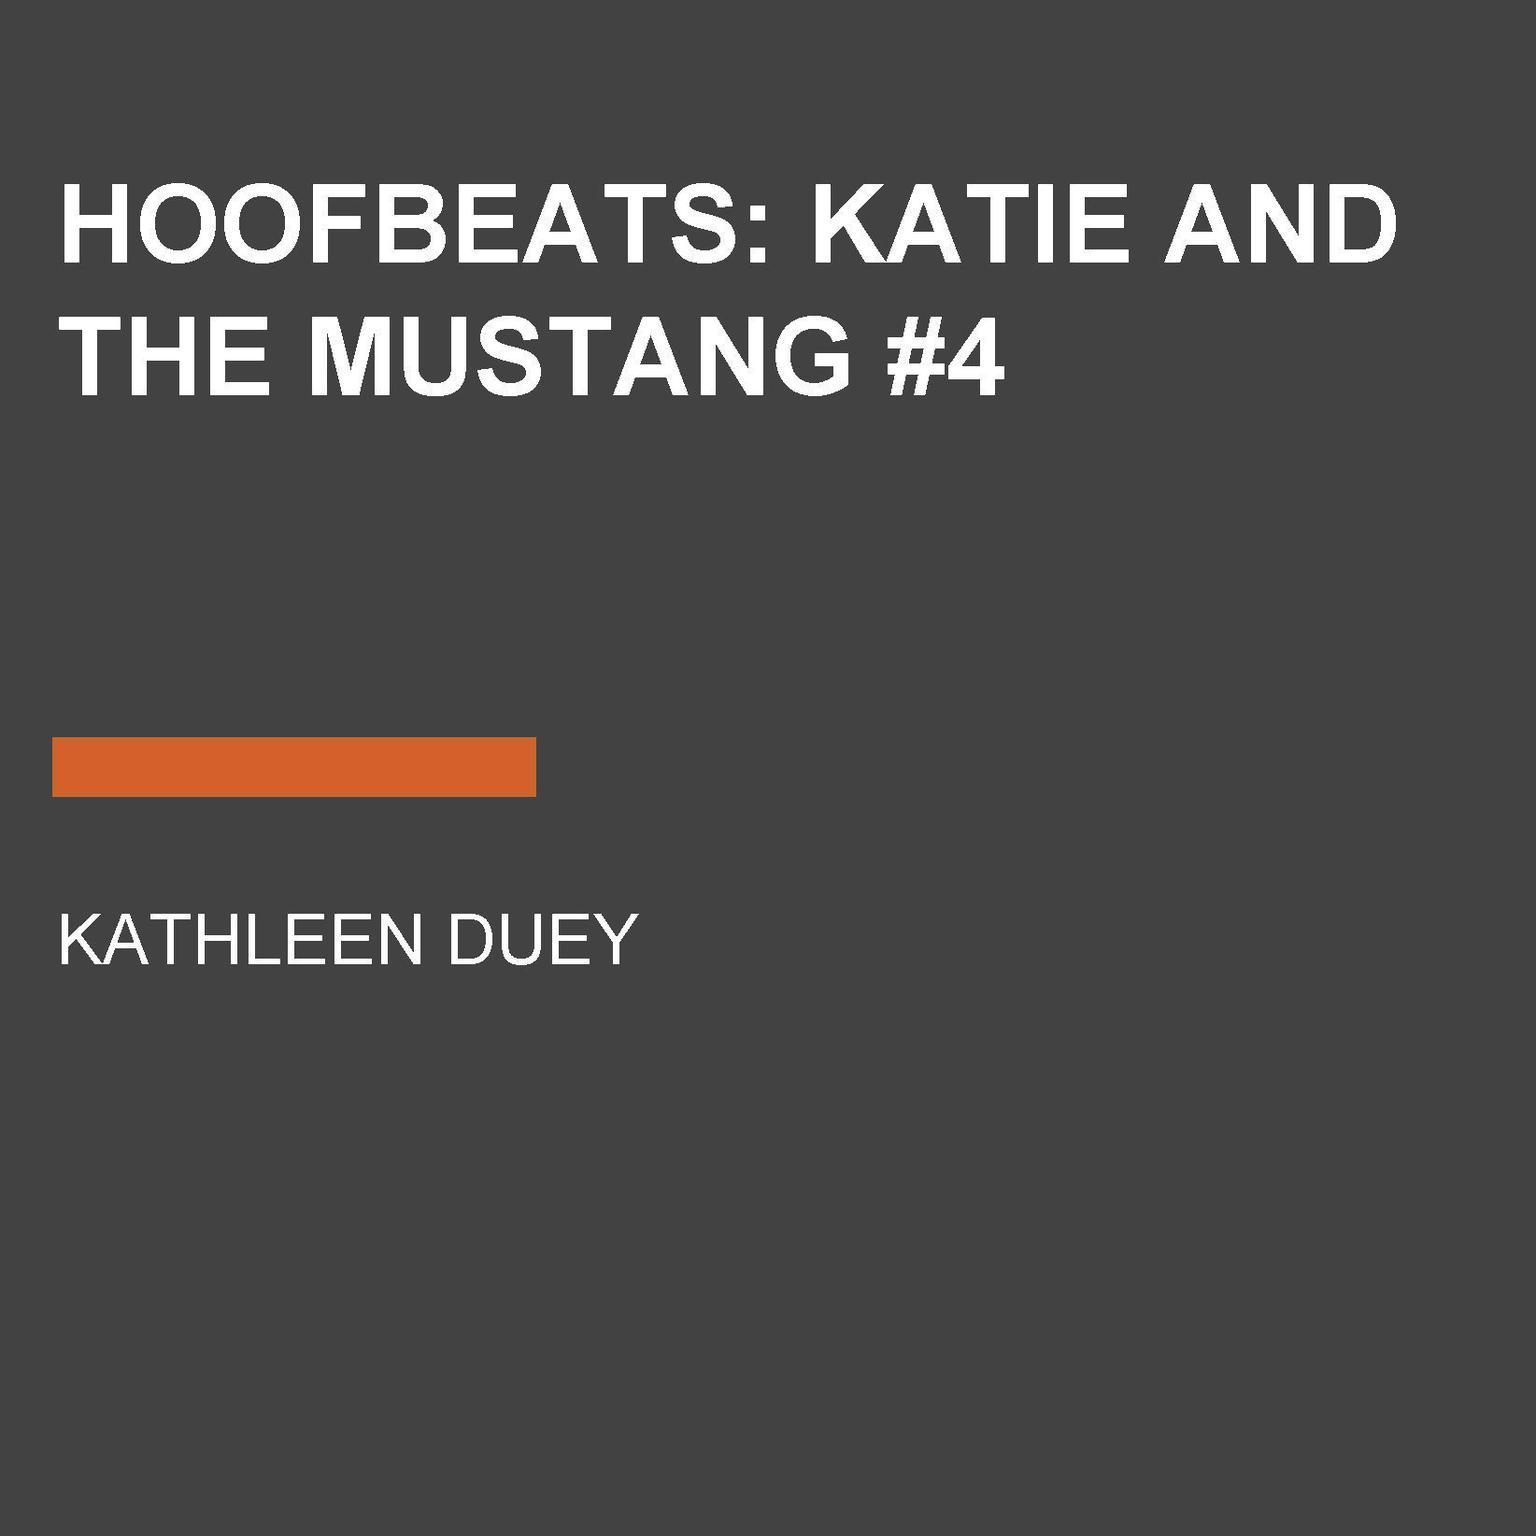 Hoofbeats: Katie and the Mustang #4 Audiobook, by Kathleen Duey